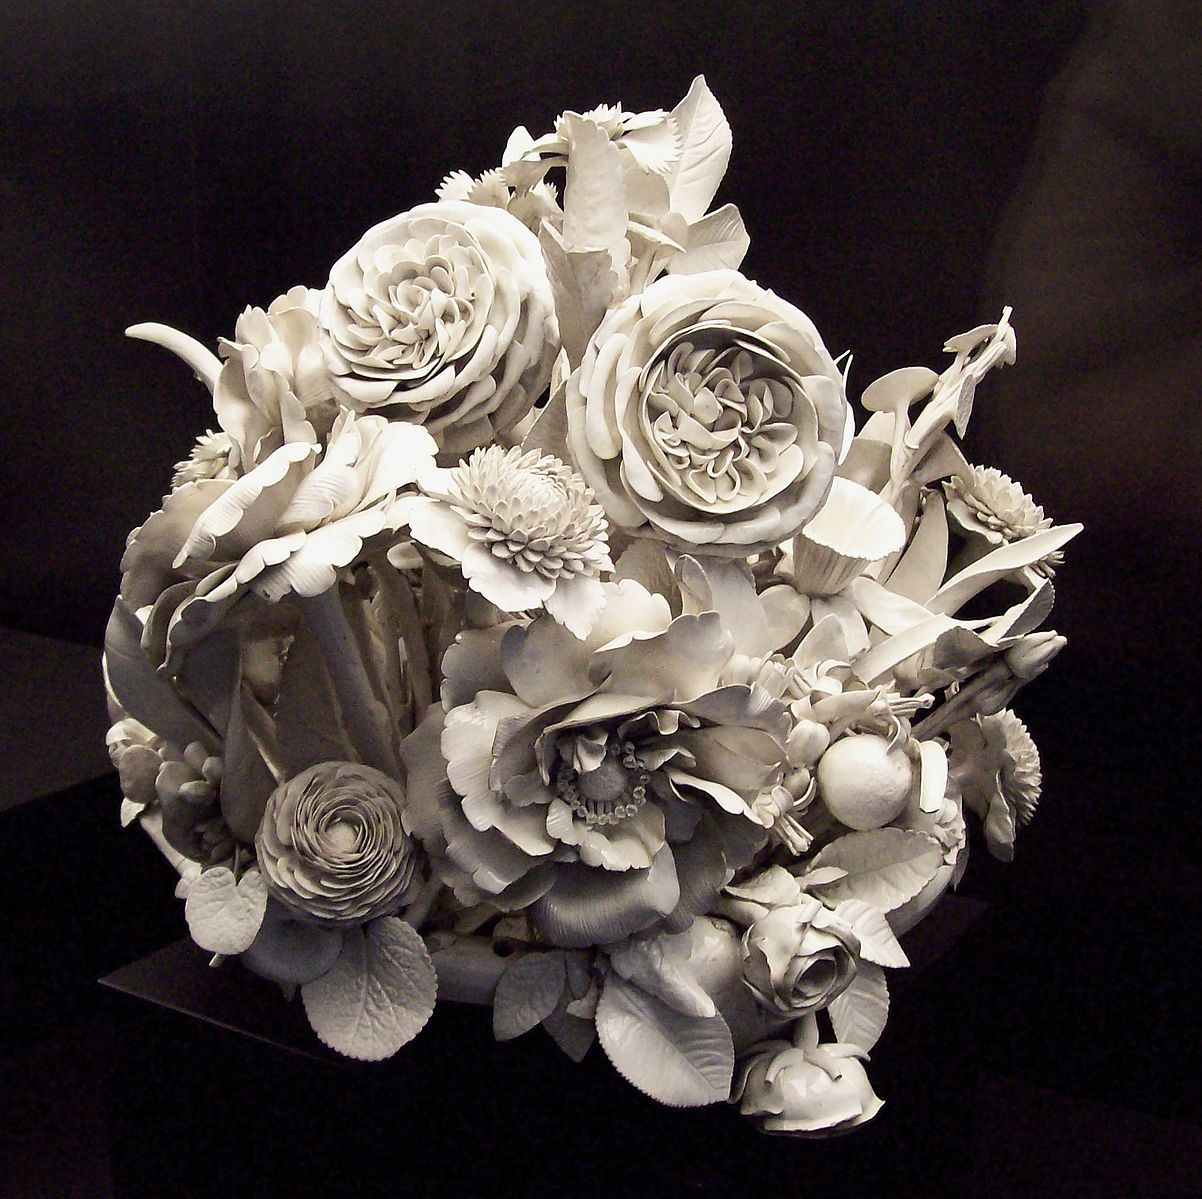 176084.Centro de flores (Porcelana Buen Retiro, MAN 1982